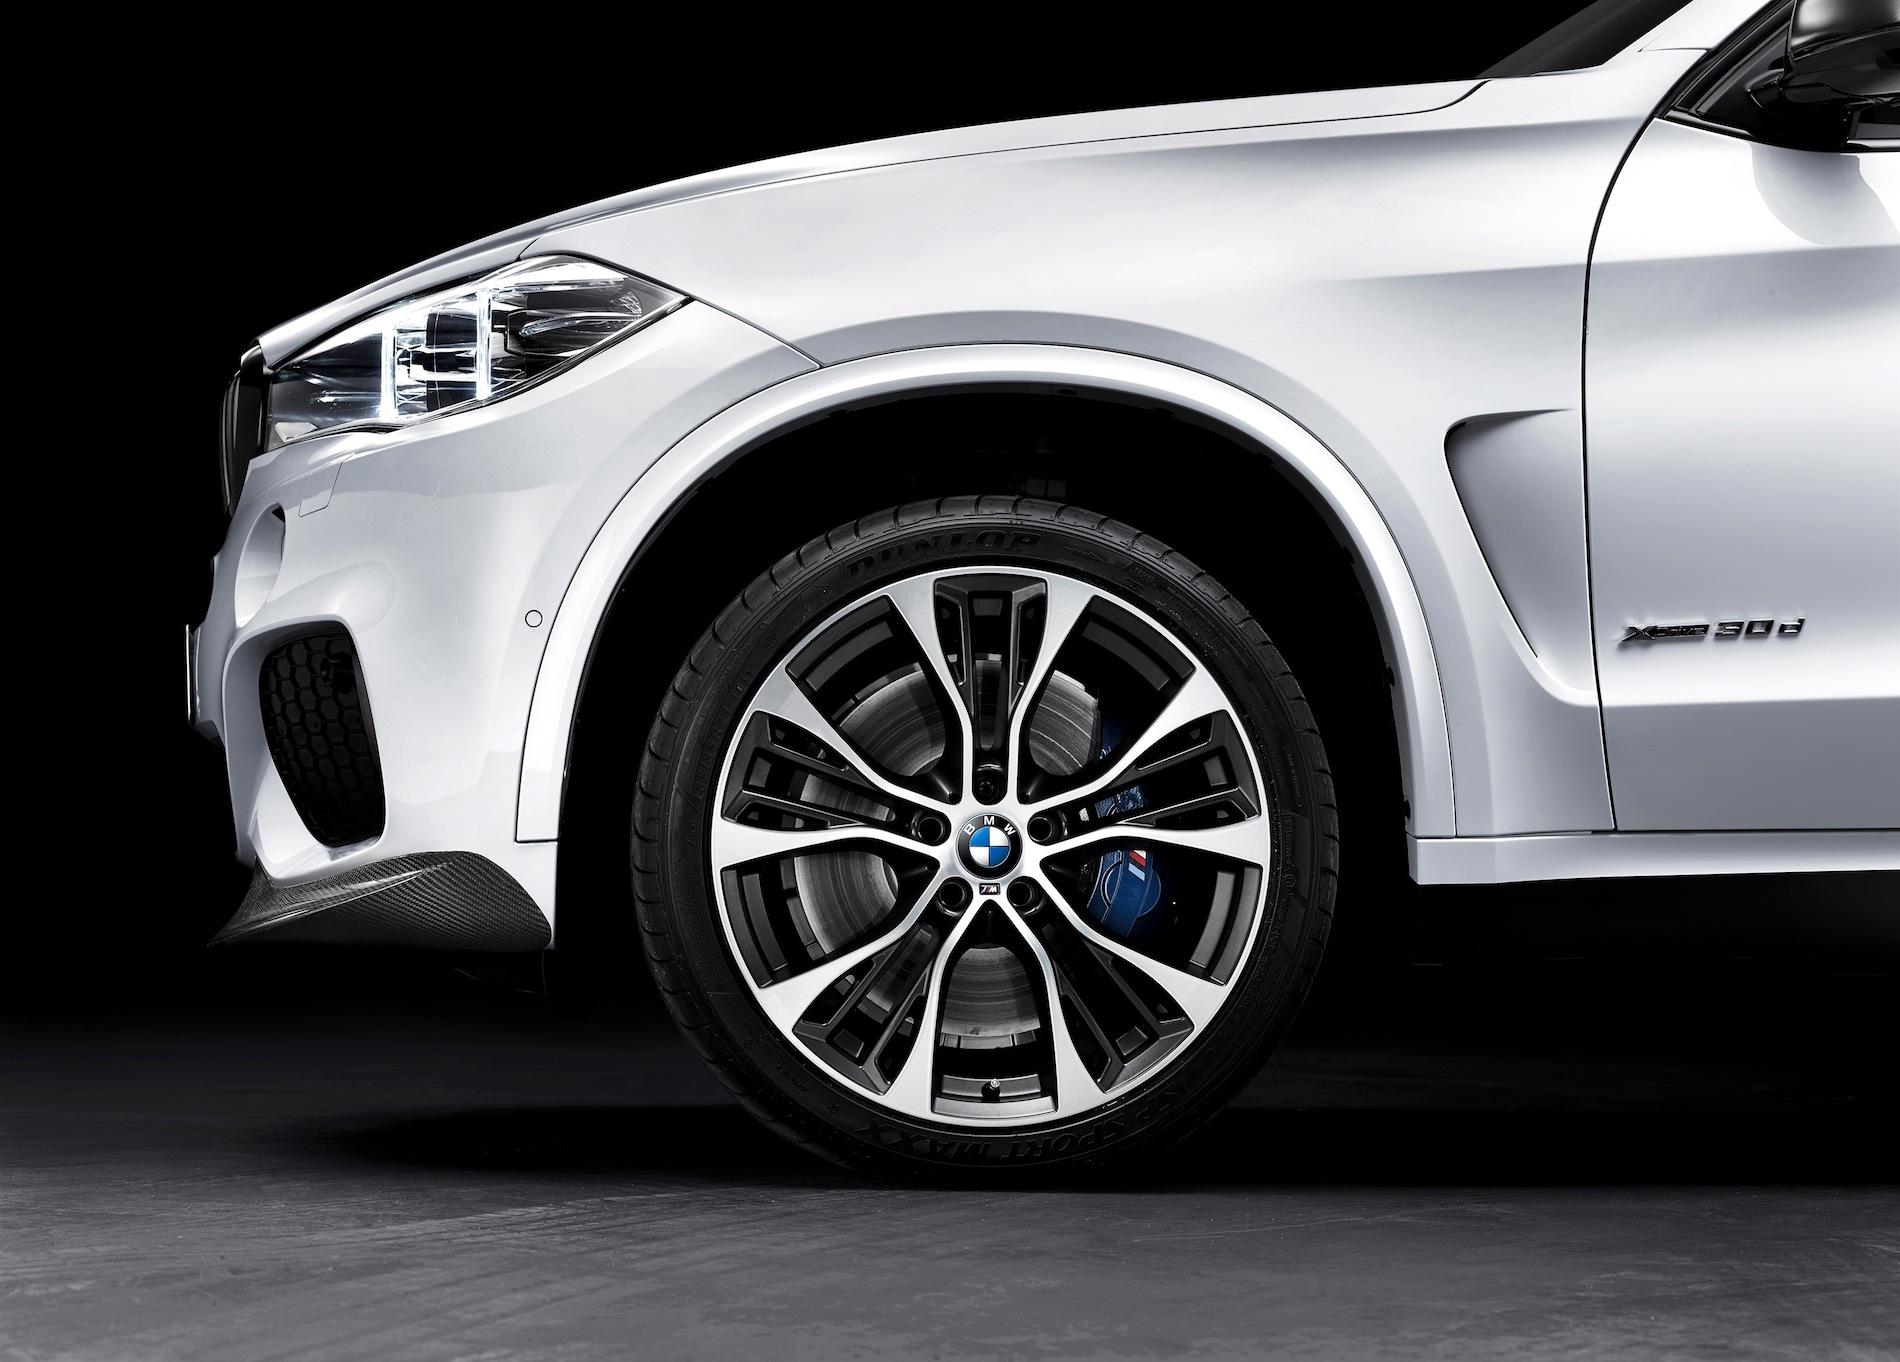 2014 Bmw X5 M Performance Parts Announced